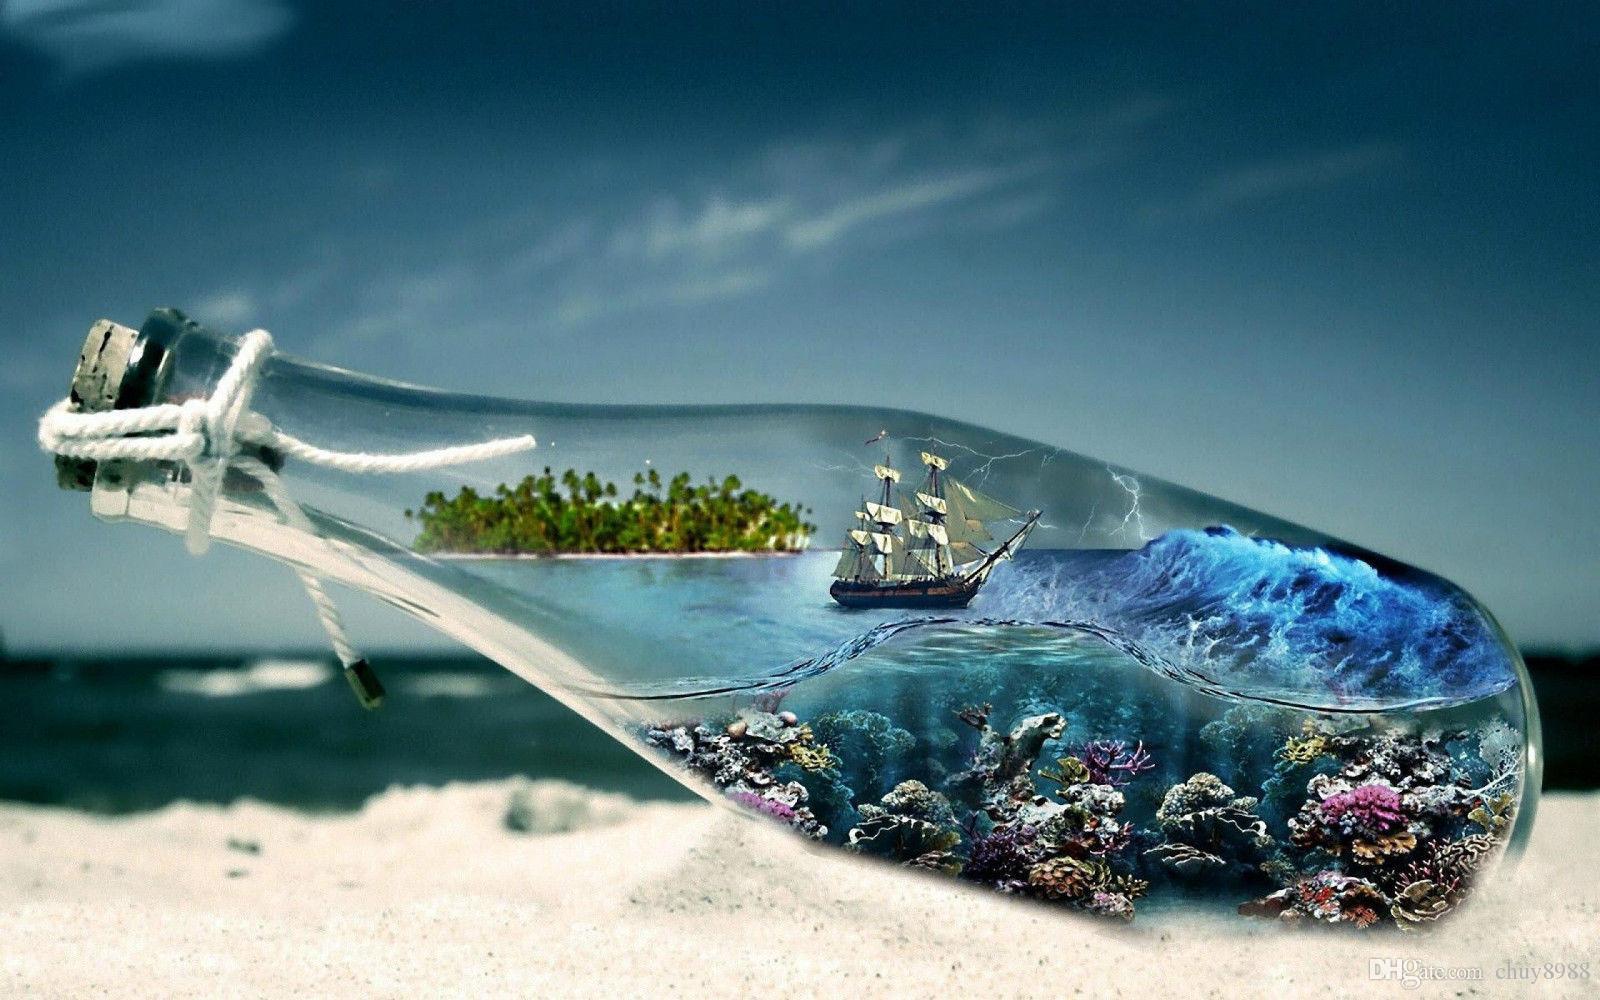 Sailing Ship in a Bottle Art Silk Print Poster 24x36inch(60x90cm) 087